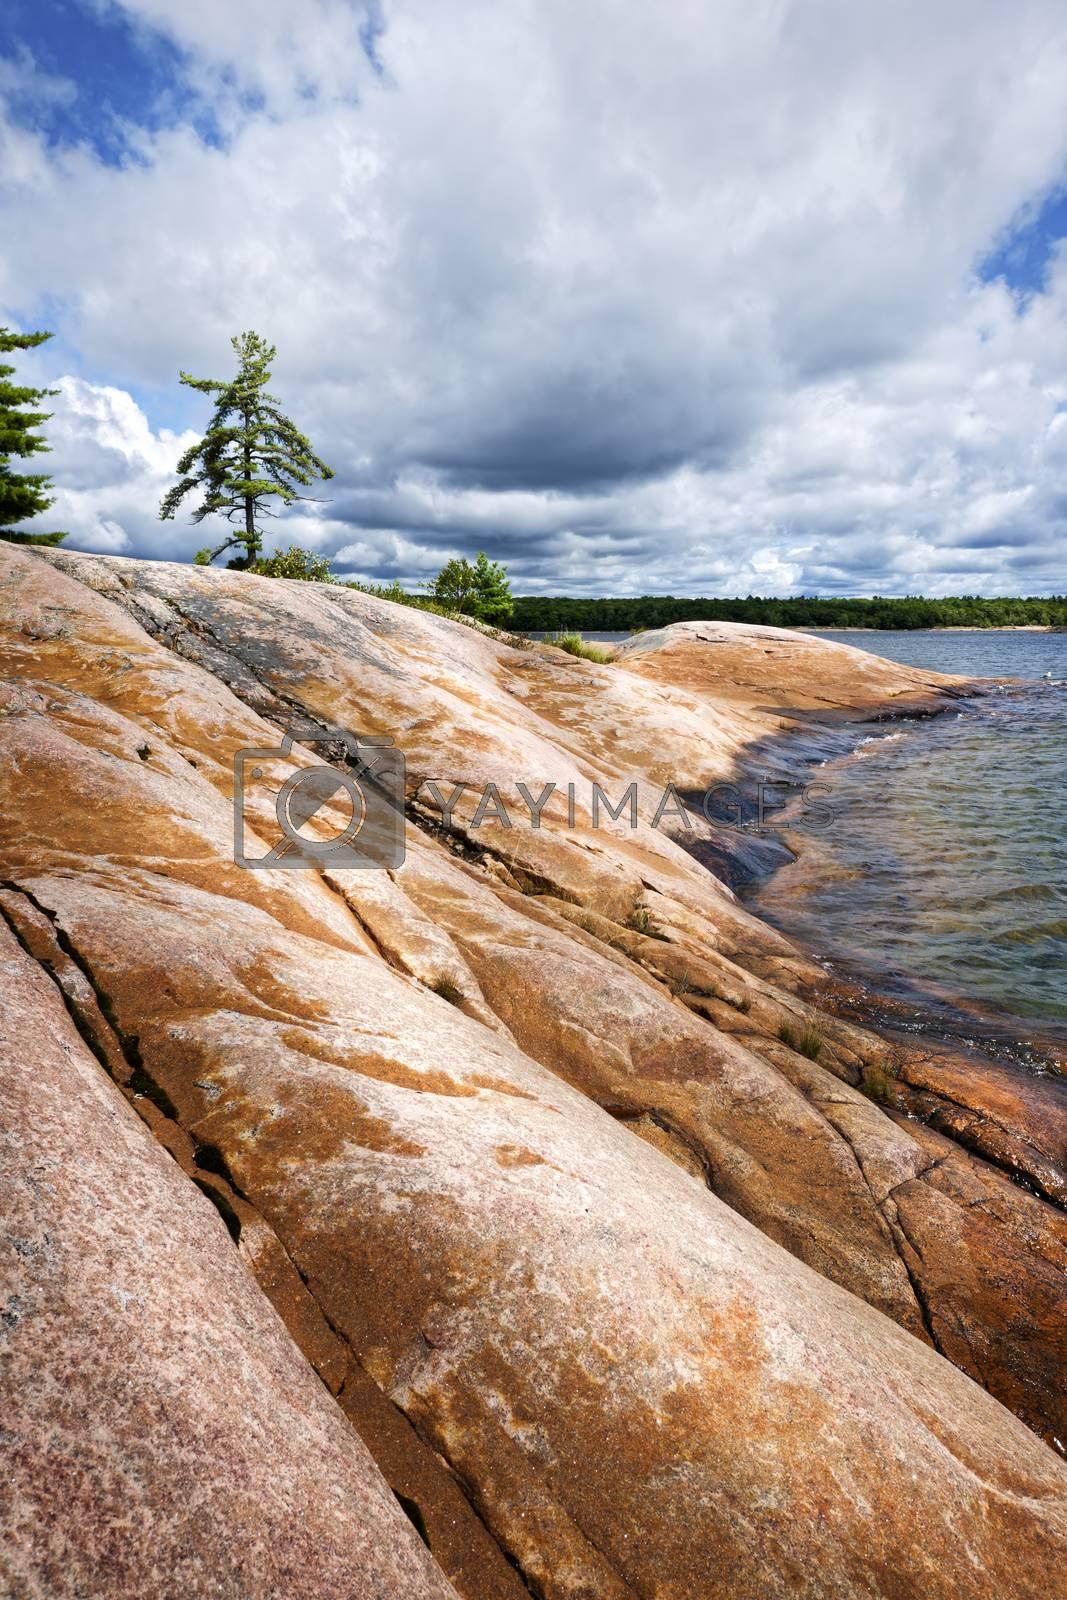 Smooth rocky lake shore of Georgian Bay in Killbear provincial park near Parry Sound, Ontario, Canada.